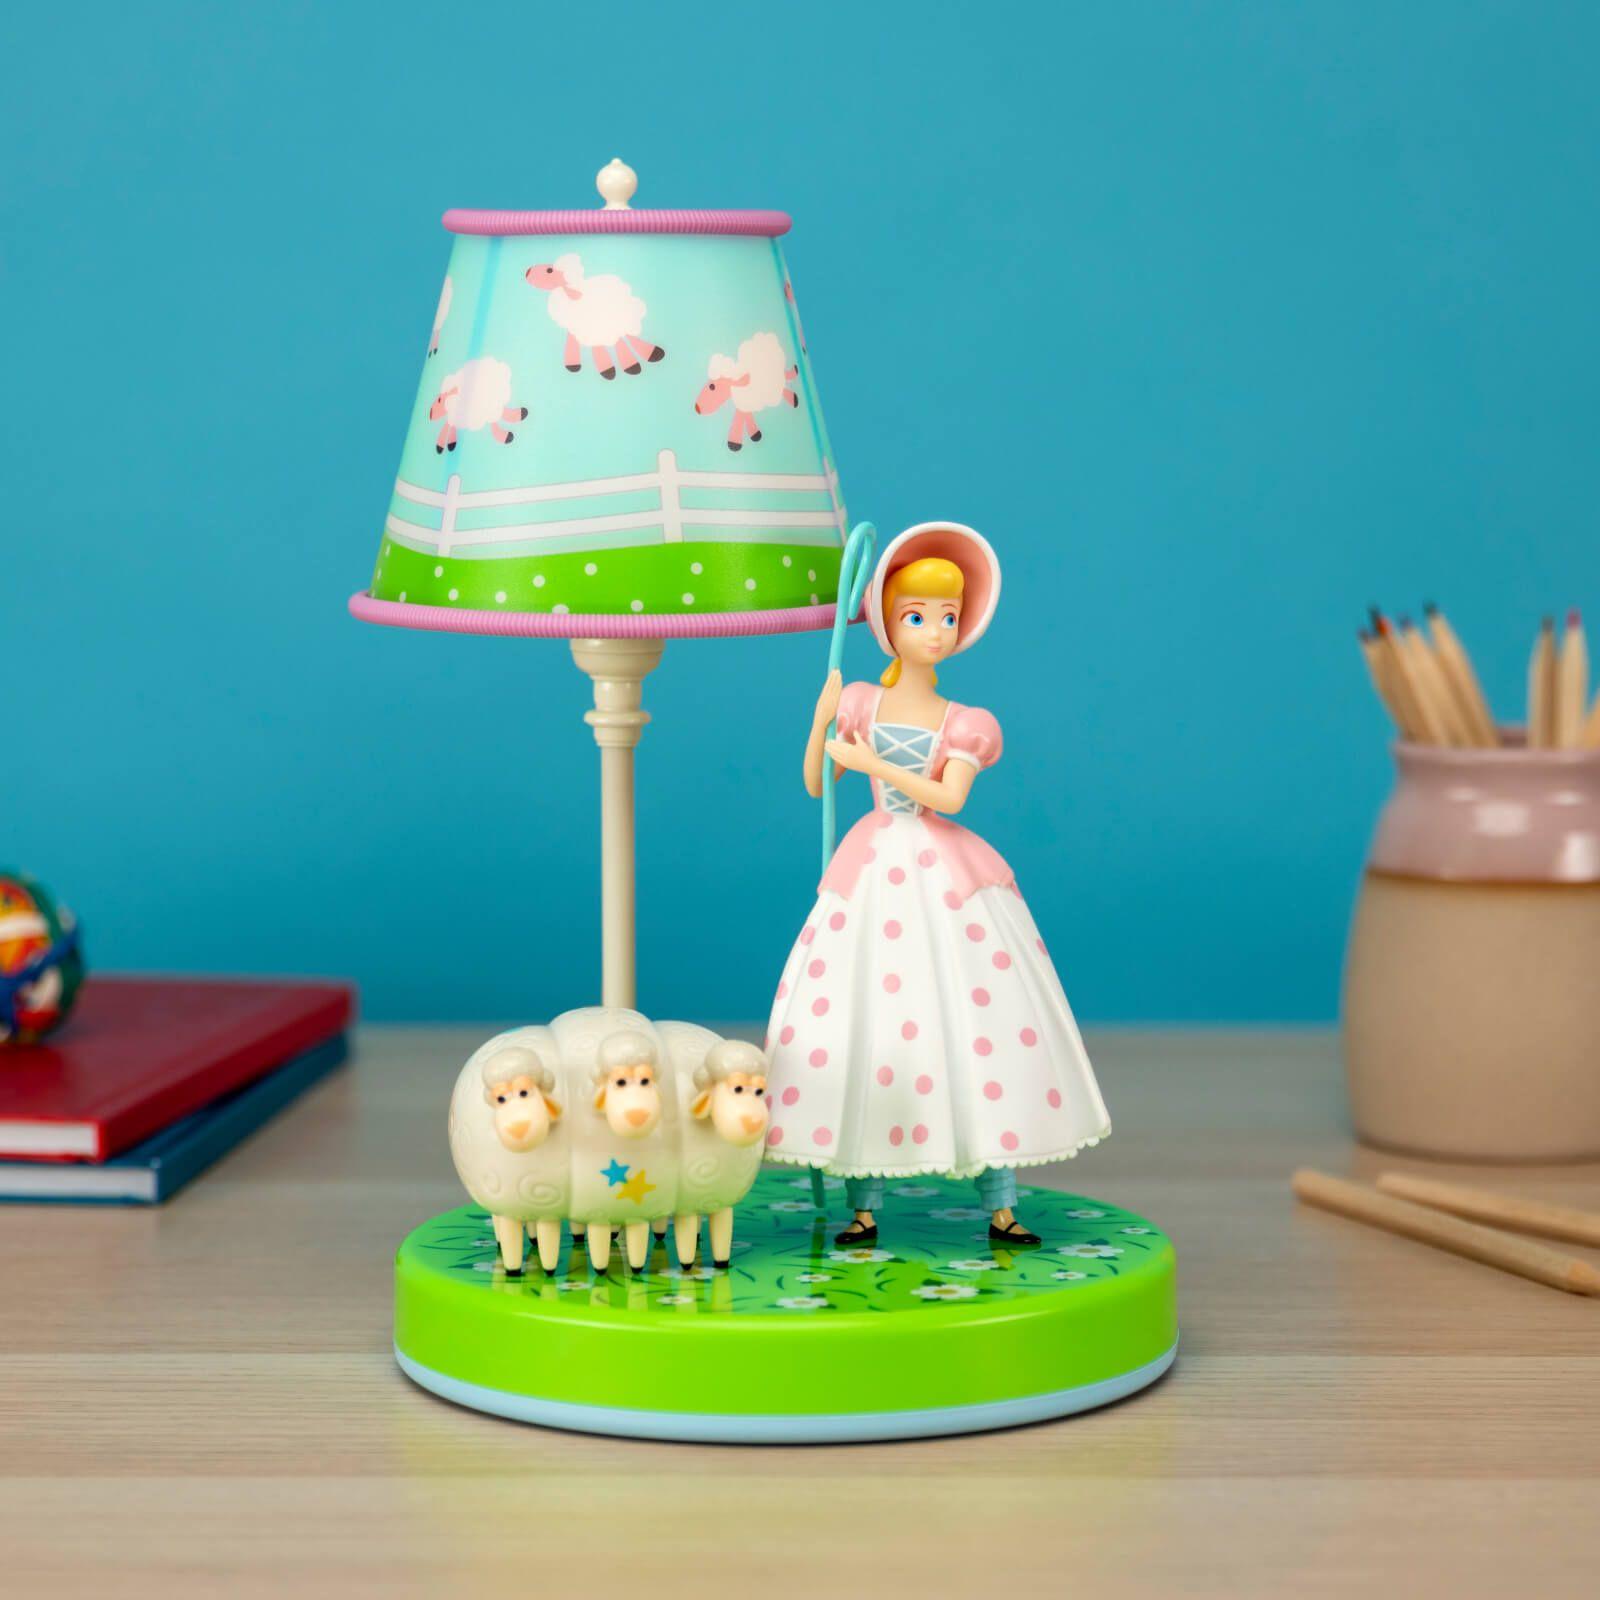 Toy Story Bo Peep Lamp In 2020 Disney Toys Toy Story Bo Peep